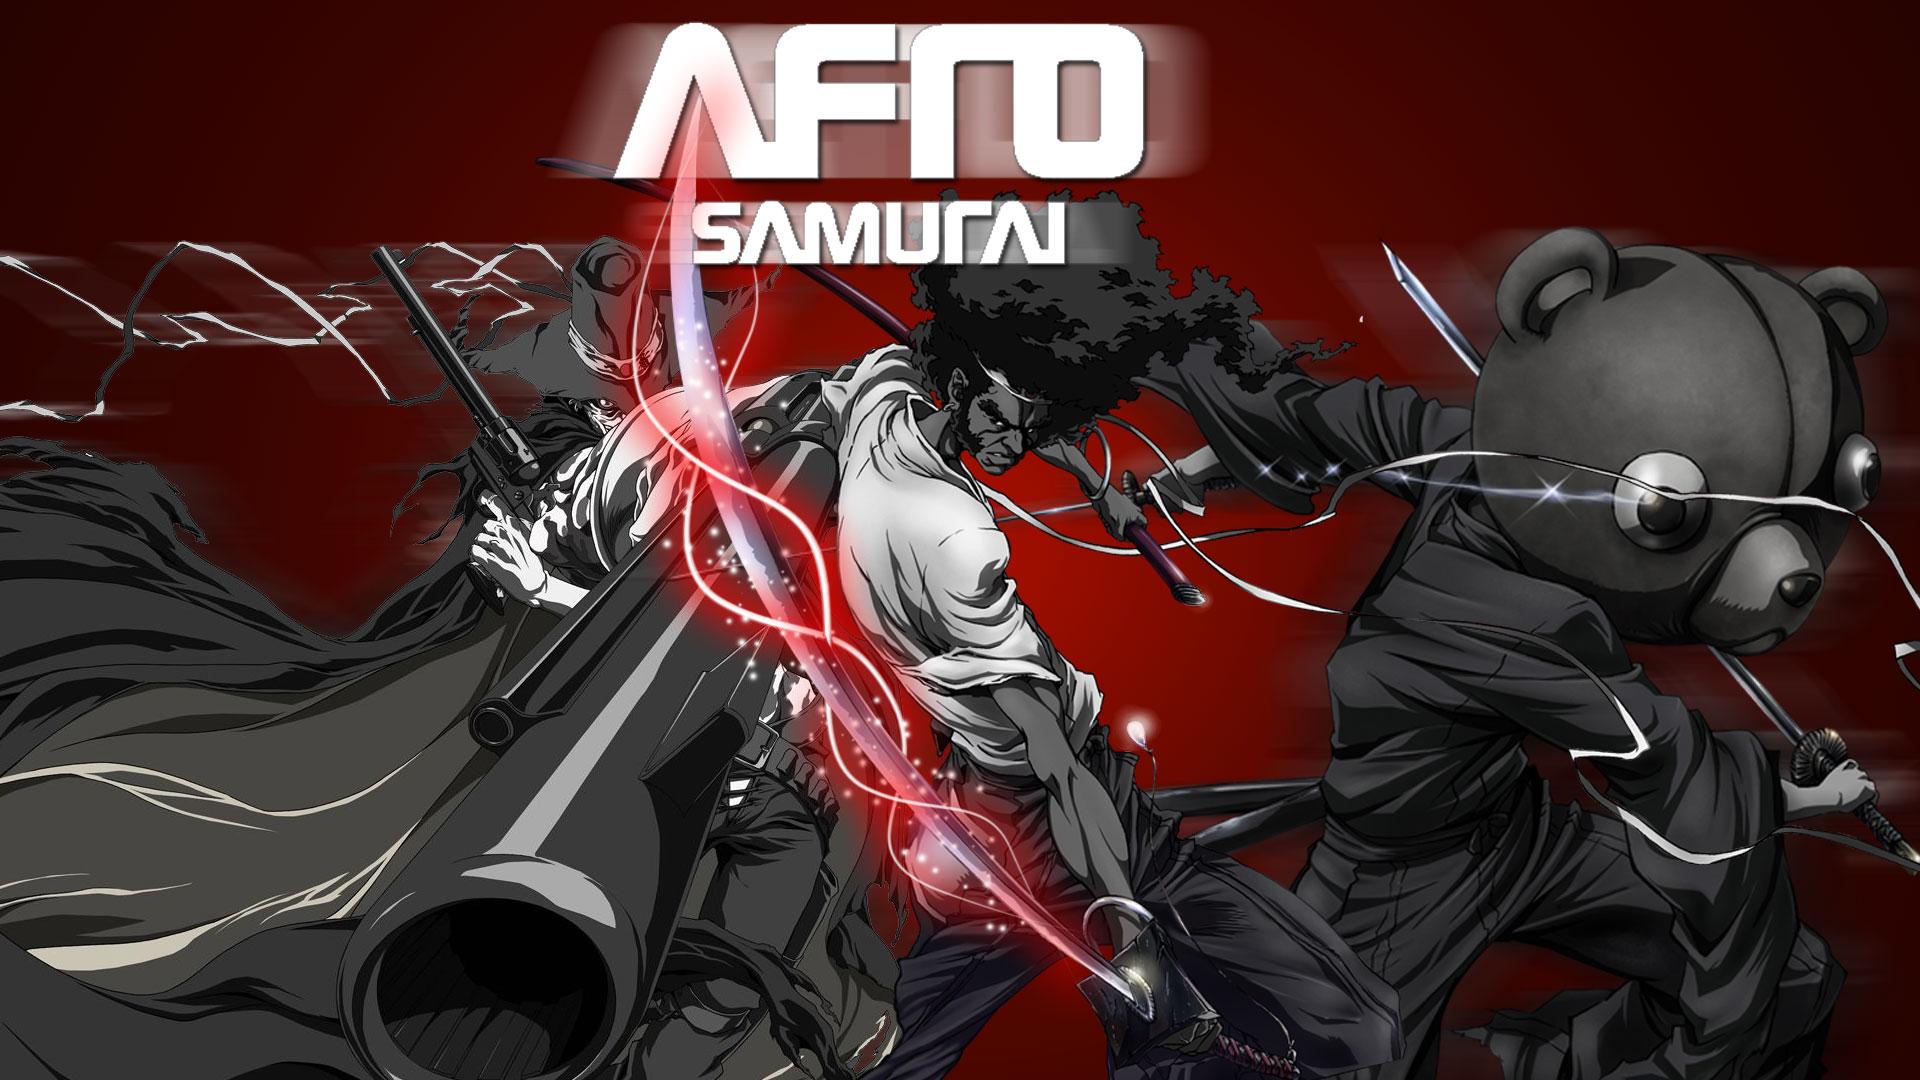 afro samurai anime game d wallpaper 1920x1080 91847